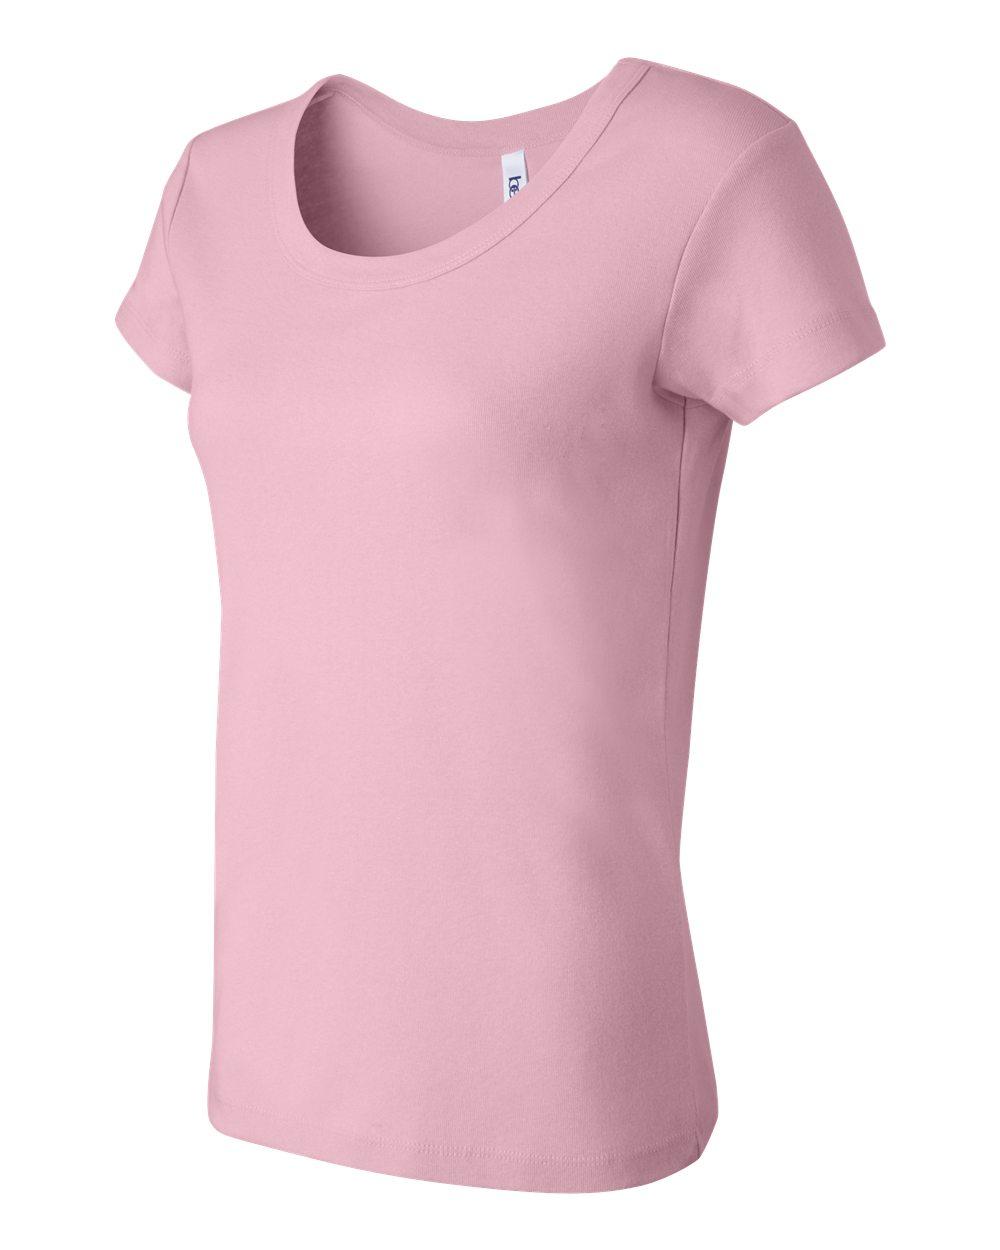 Bella 1003 Pink